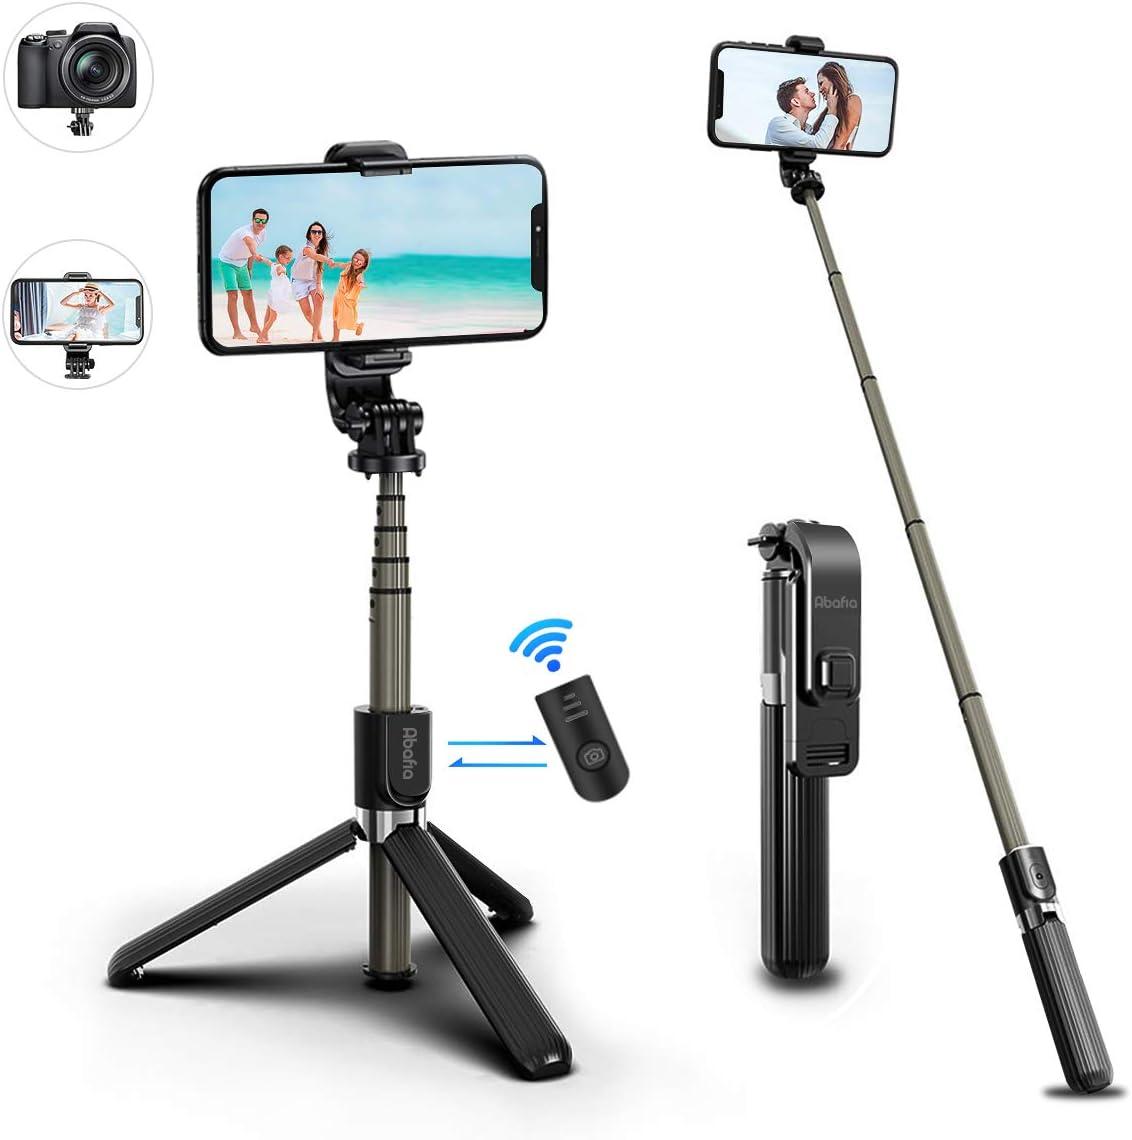 Abafia Palo Selfie, Mini Tripodes para Moviles 3 en 1 Extensible Stick, Selfie Stick con Control Remoto Bluetooth para iPhone/Galaxy/Honor/Redmi/Otros Teléfonos Inteligente con Android/iOS, Caméra